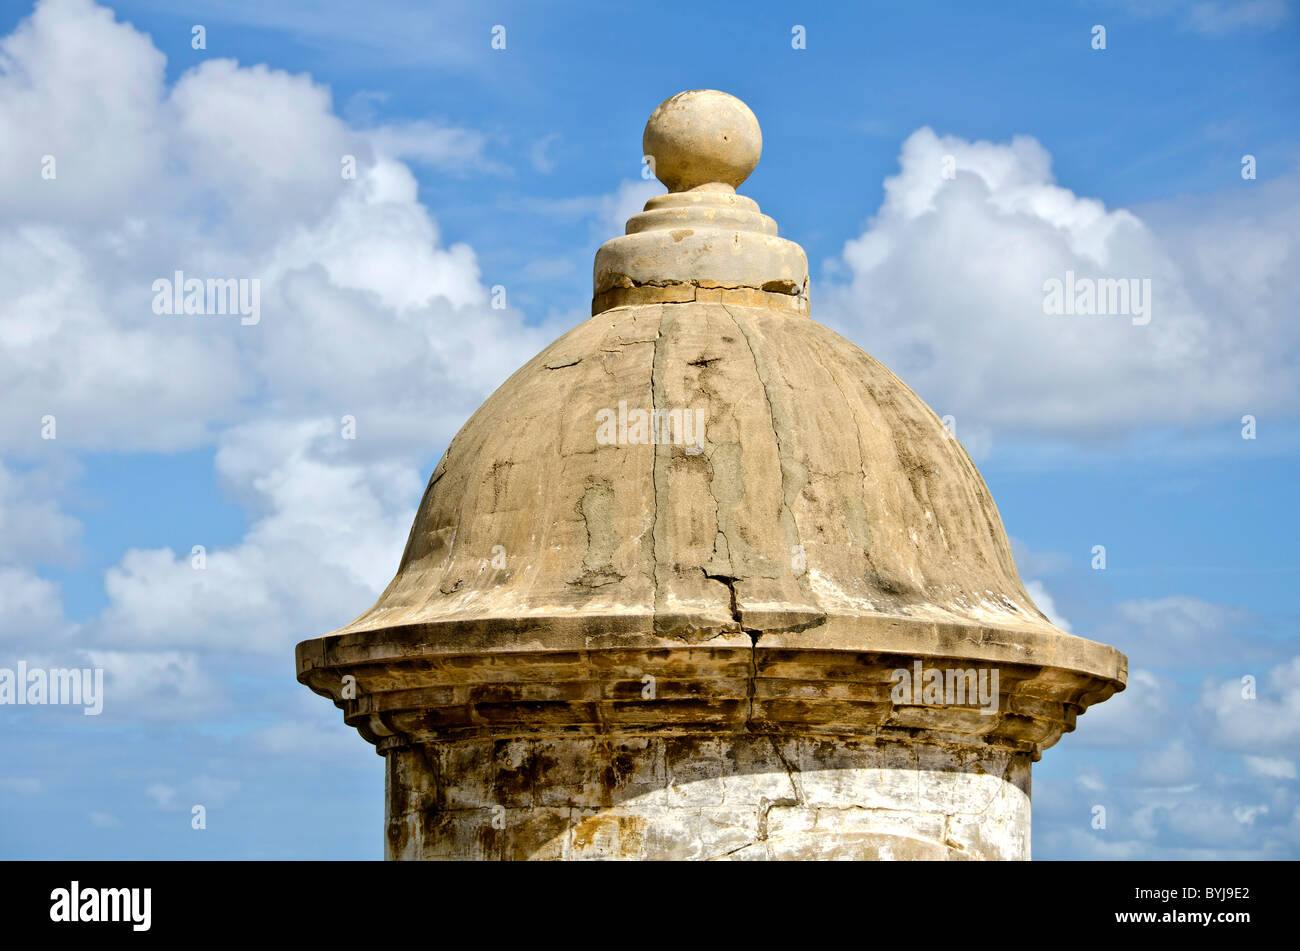 Puerto Rico Old San Juan sentry box or garita showing top of iconic national symbol  at Fort San Cristobal - Stock Image